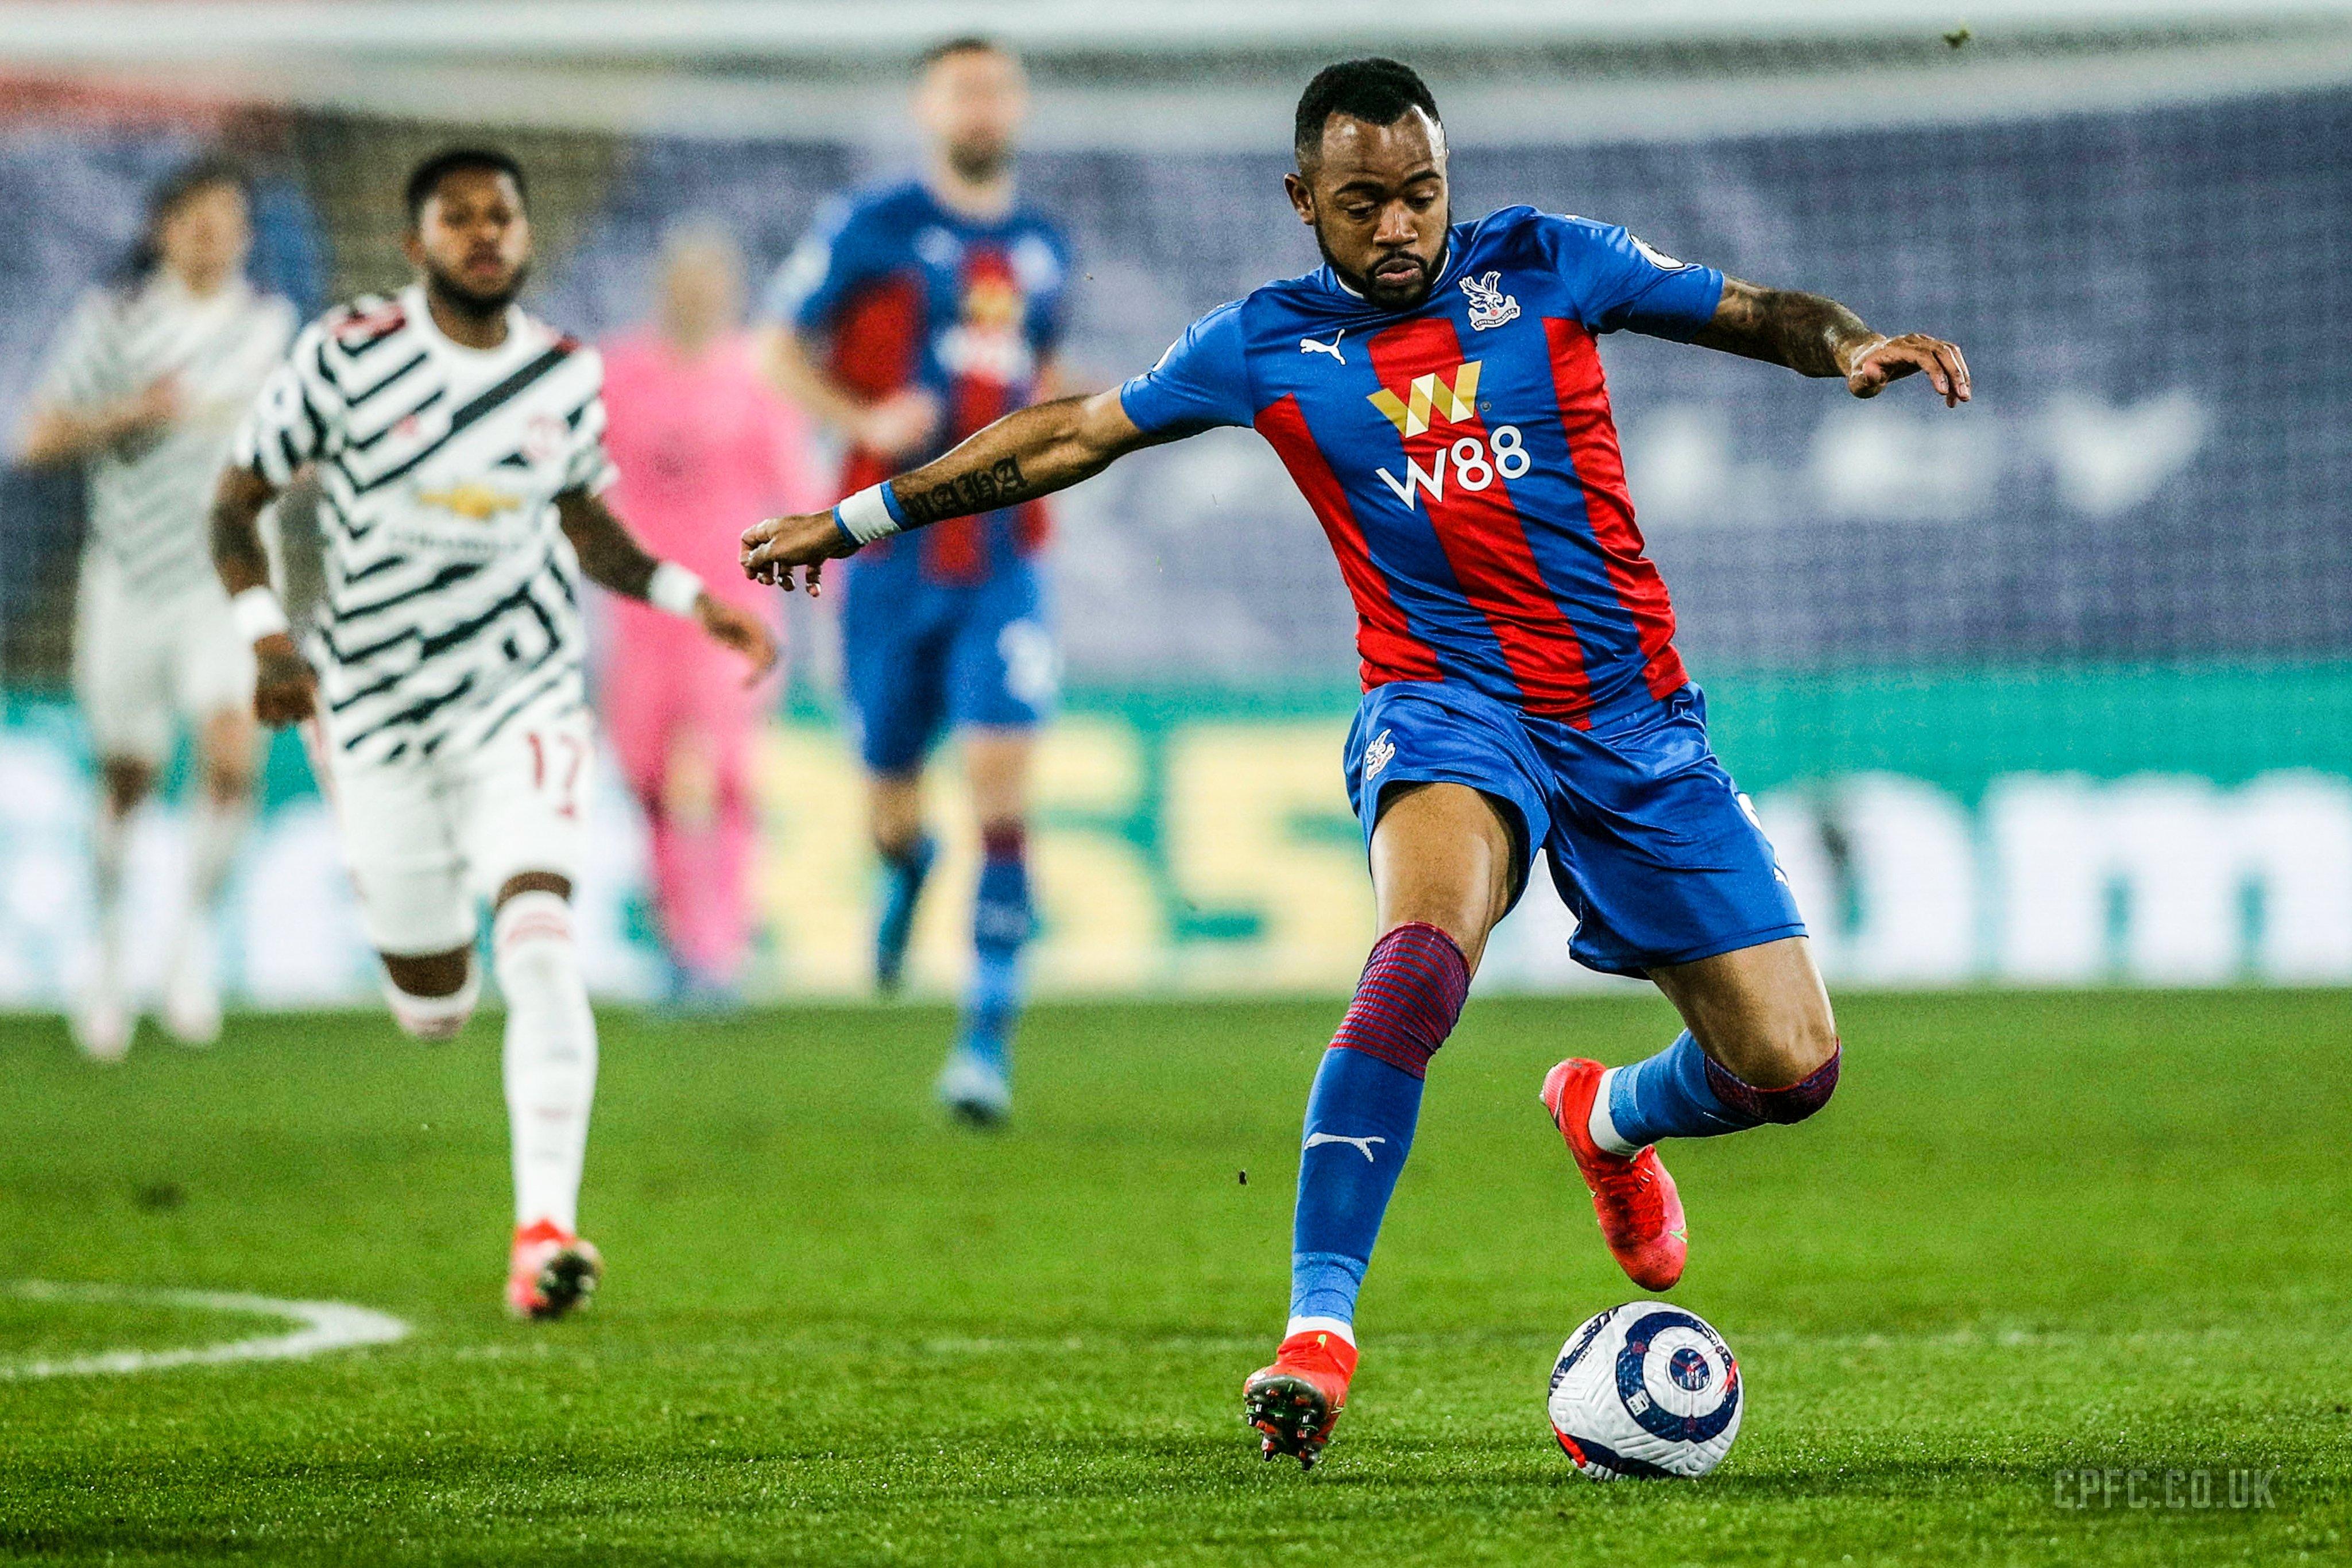 REVEALED: Ghana striker Jordan Ayew on a £32,500 weekly wage at Crystal Palace